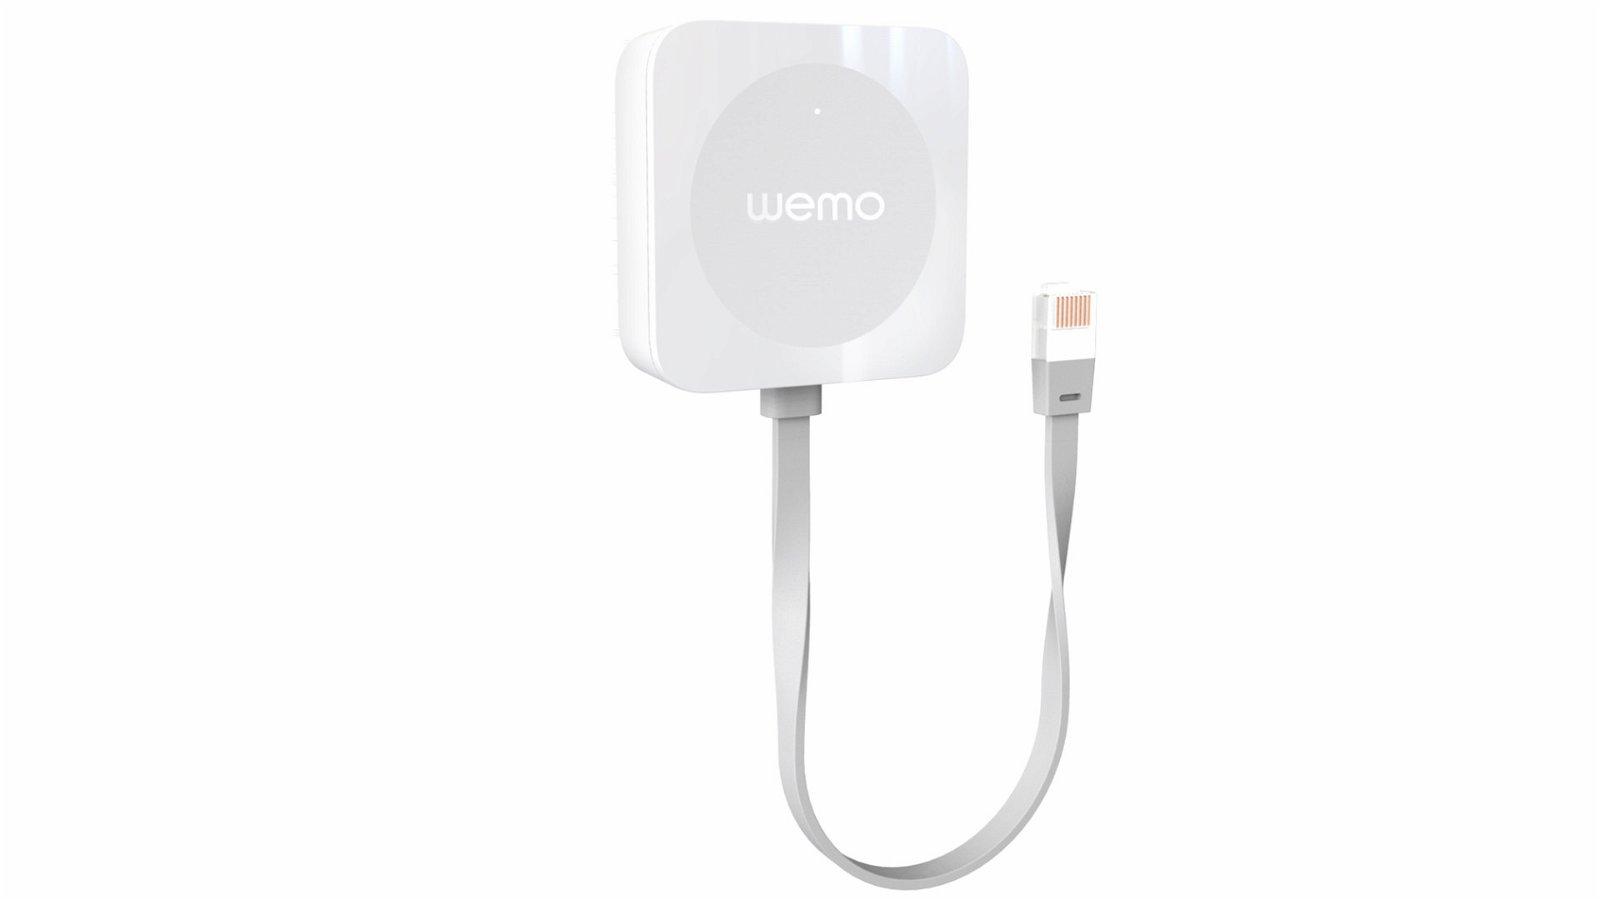 WeMo Announce New Bridge with Apple Homekit Support